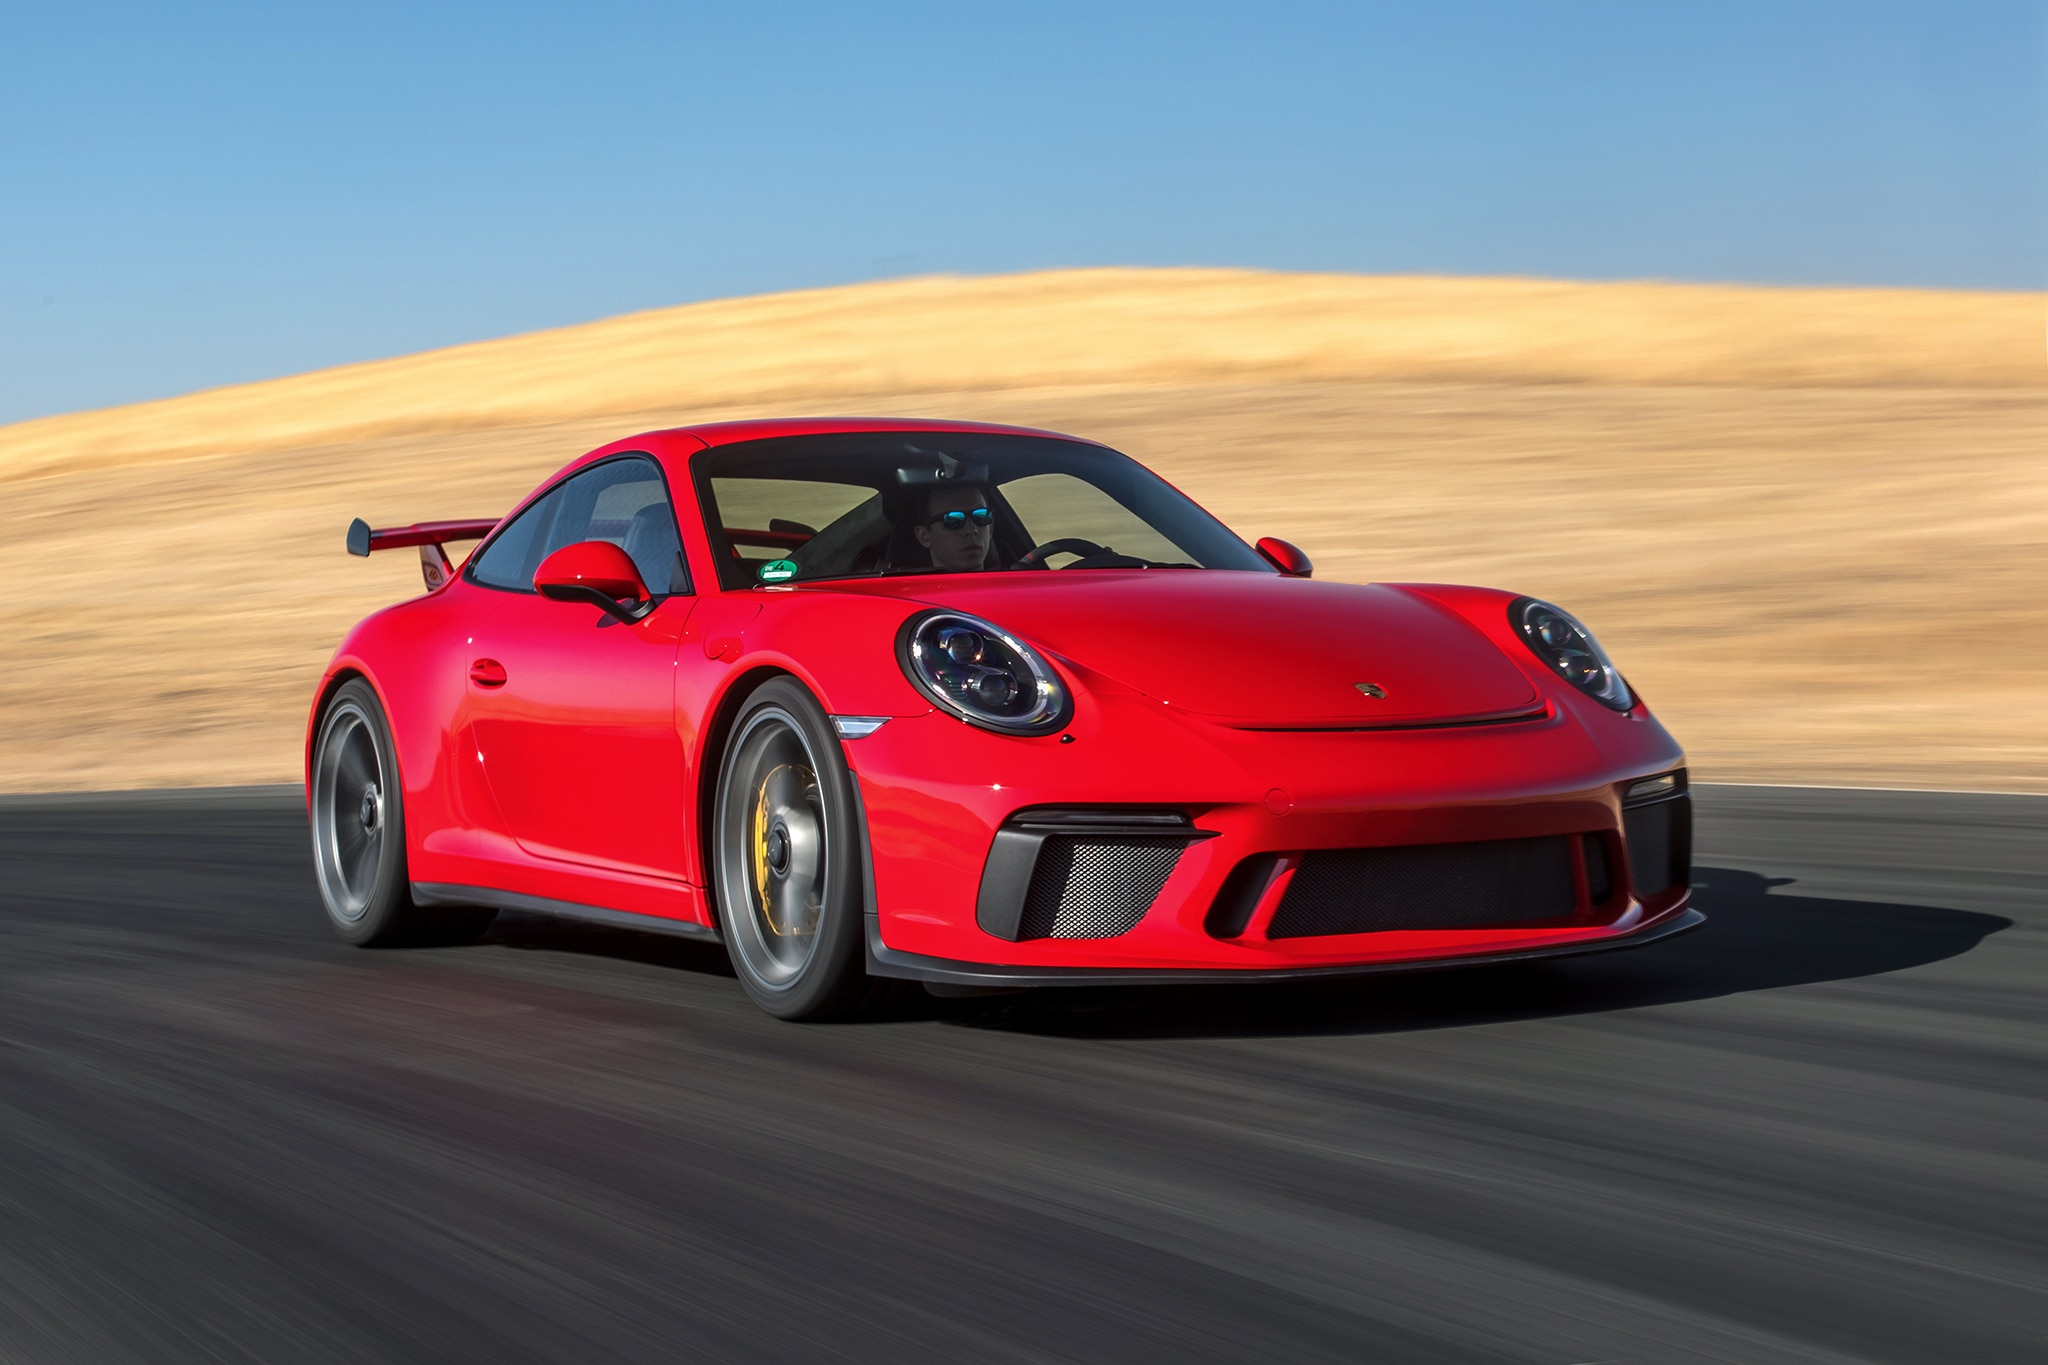 2018-Porsche-911-GT3-front-three-quarter-in-motion-03 Exciting Porsche 911 Gt2 La Centrale Cars Trend